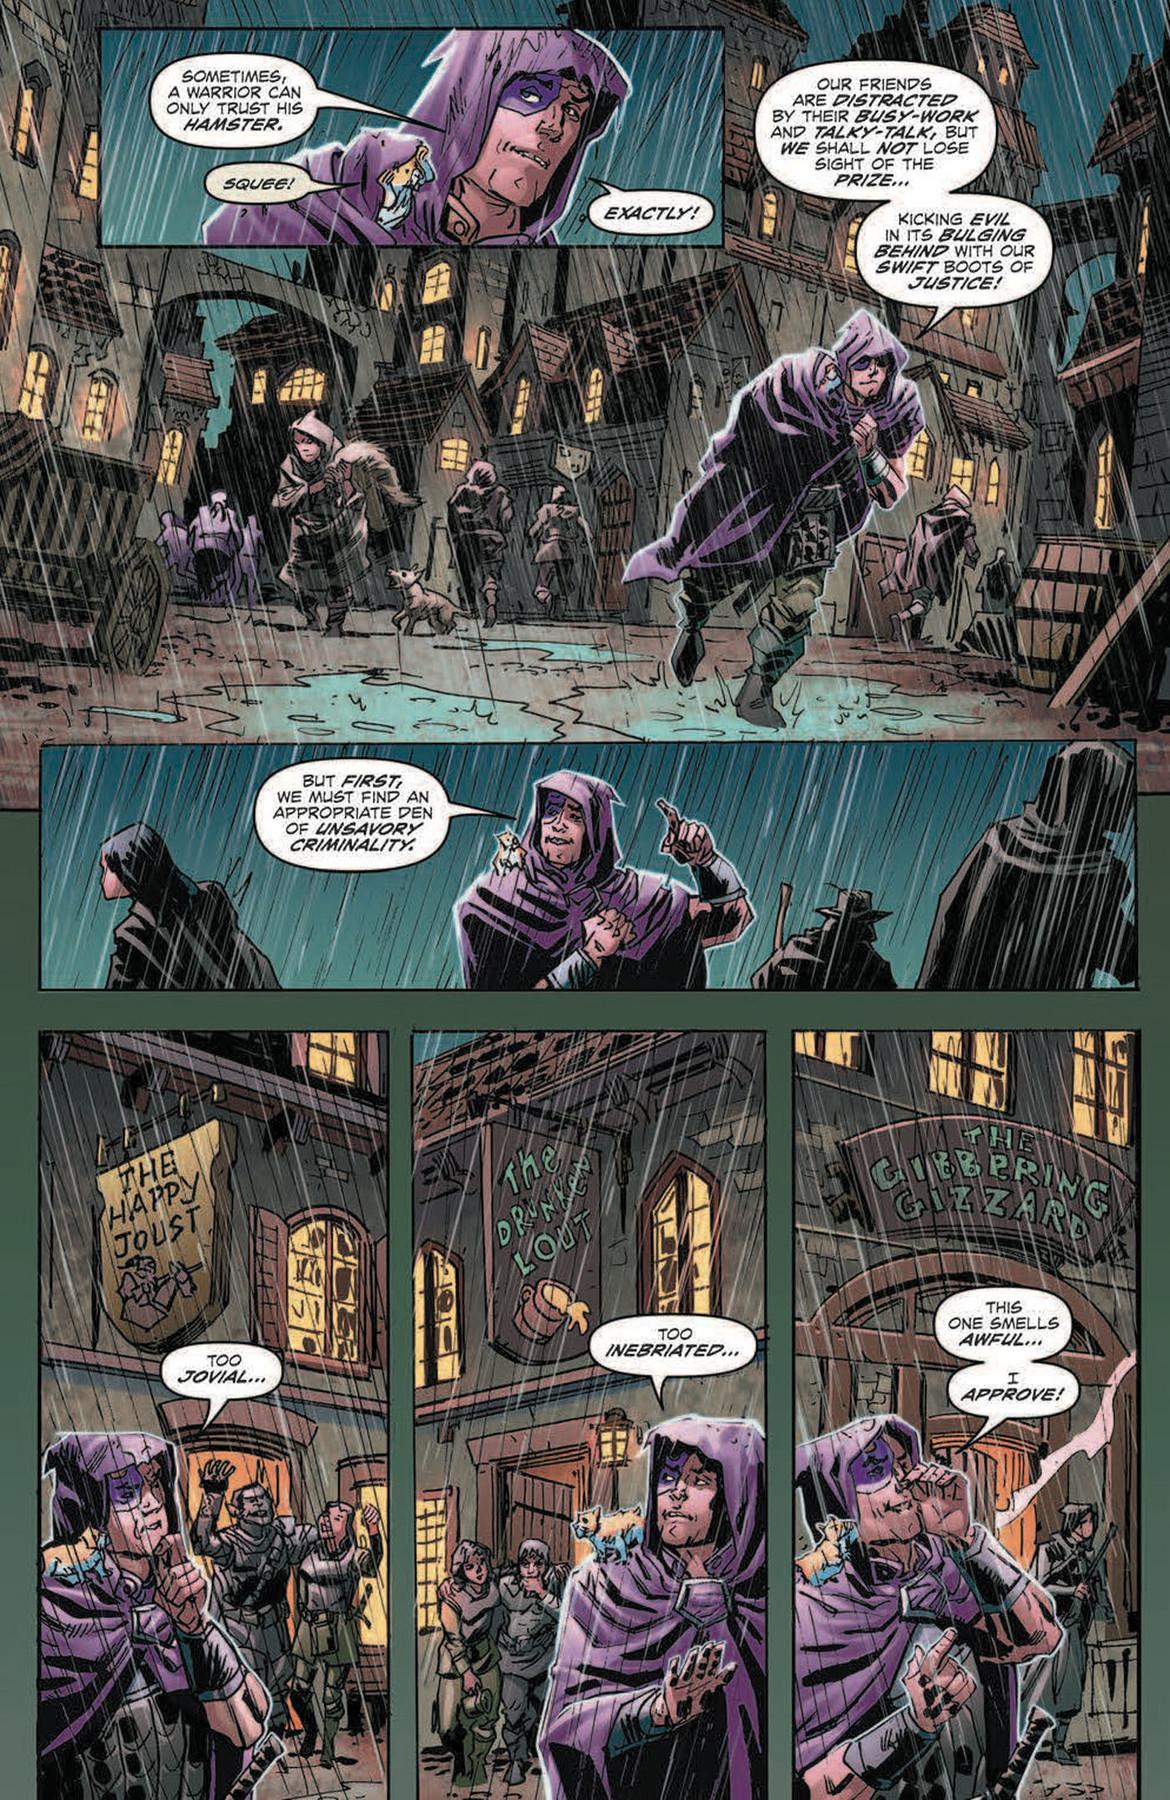 dungeons_and_dragons_evil_at_baldurs_gate_page_5.jpg